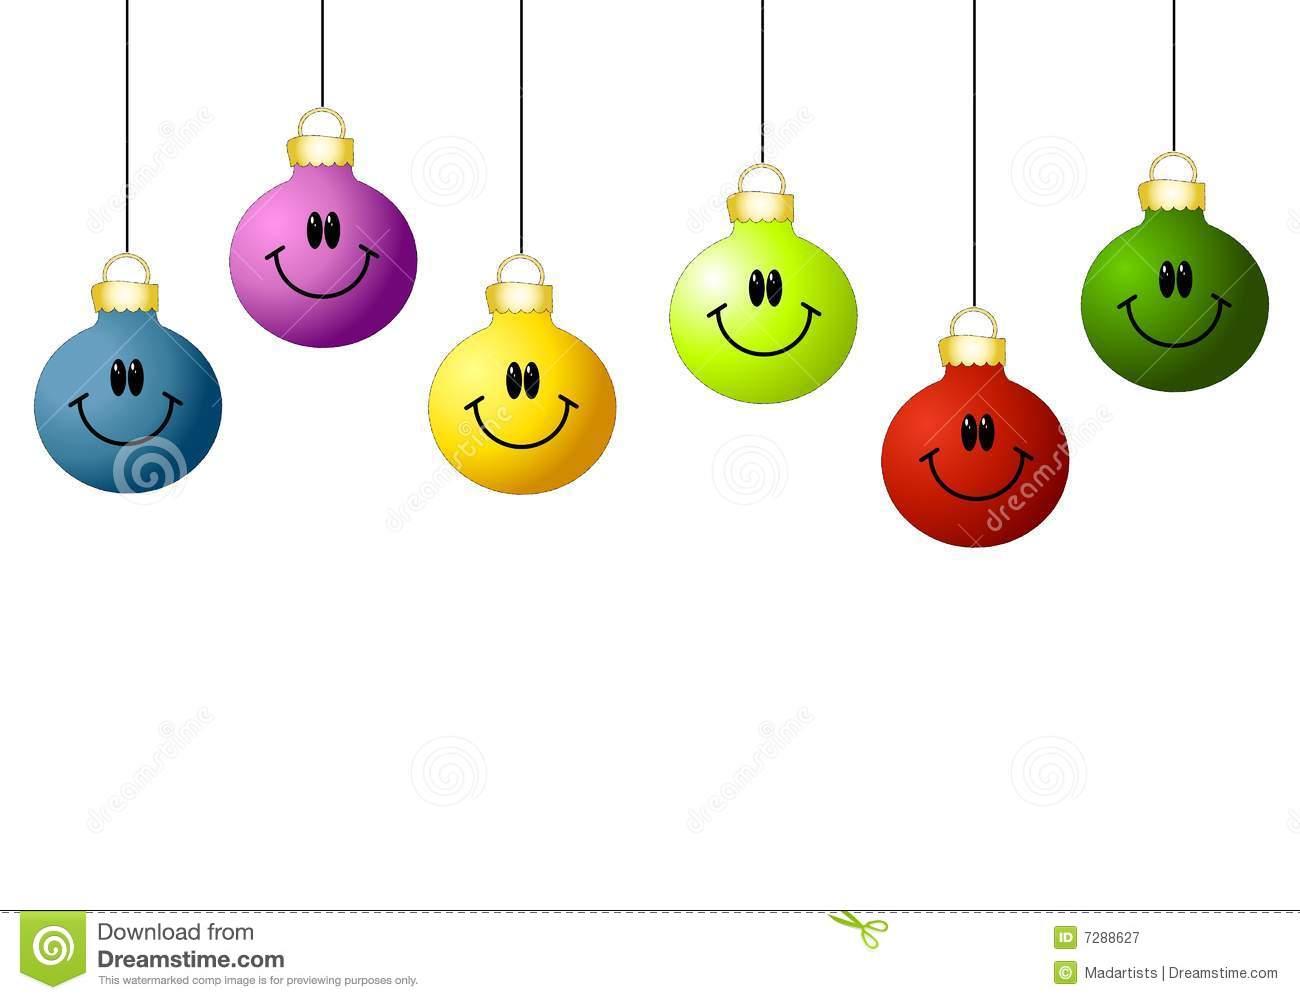 Smiley Face Ornaments stock illustration. Illustration of xmas.